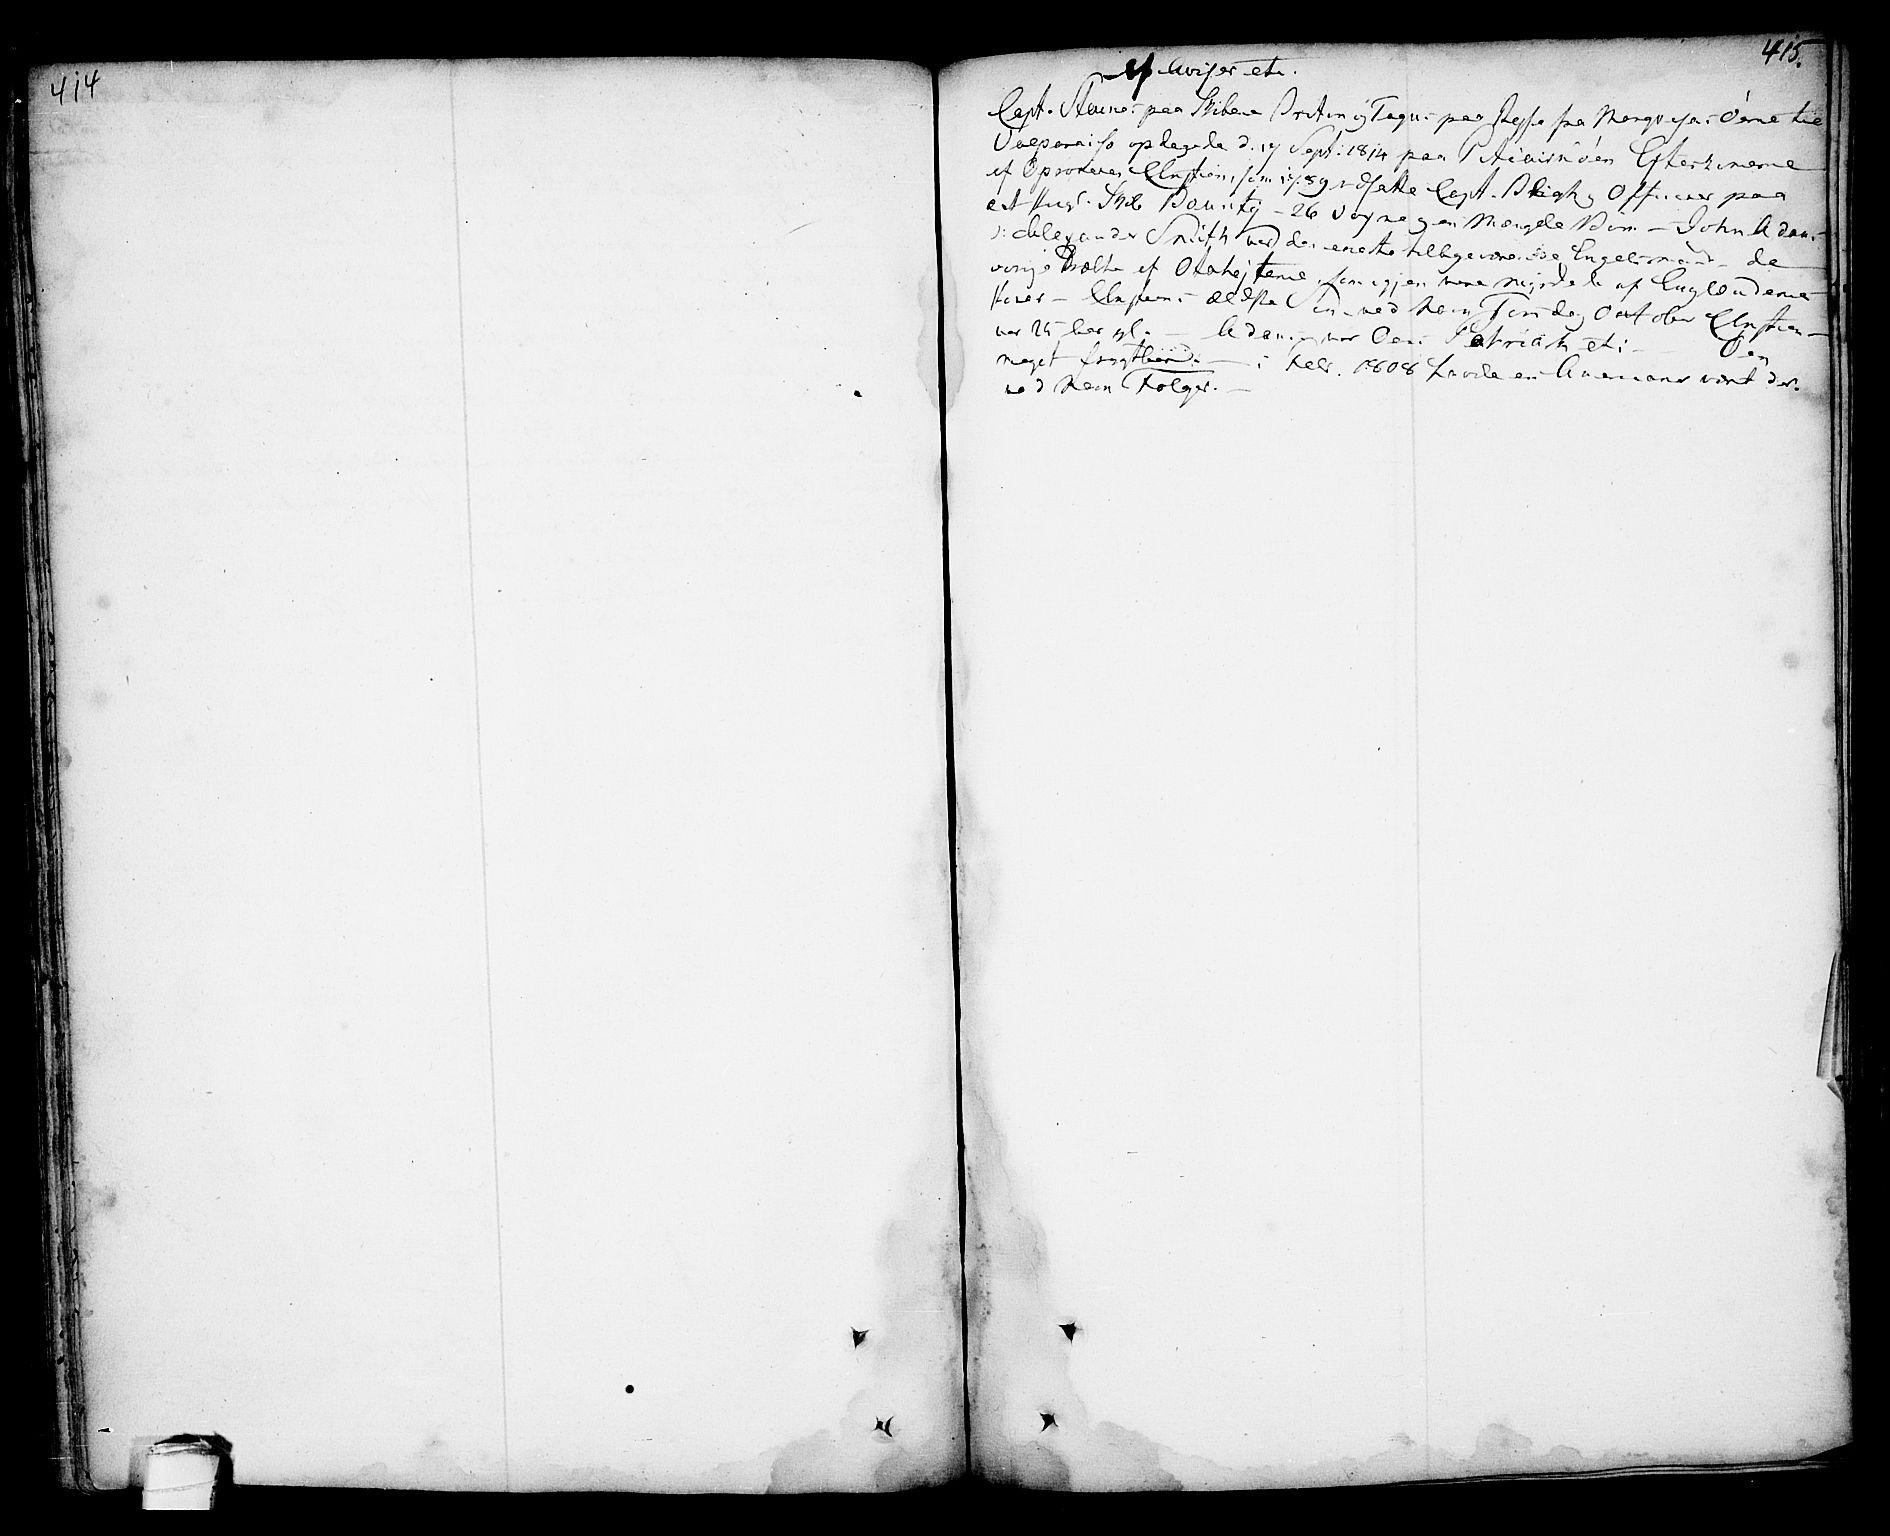 SAKO, Kragerø kirkebøker, F/Fa/L0001: Ministerialbok nr. 1, 1702-1766, s. 414-415